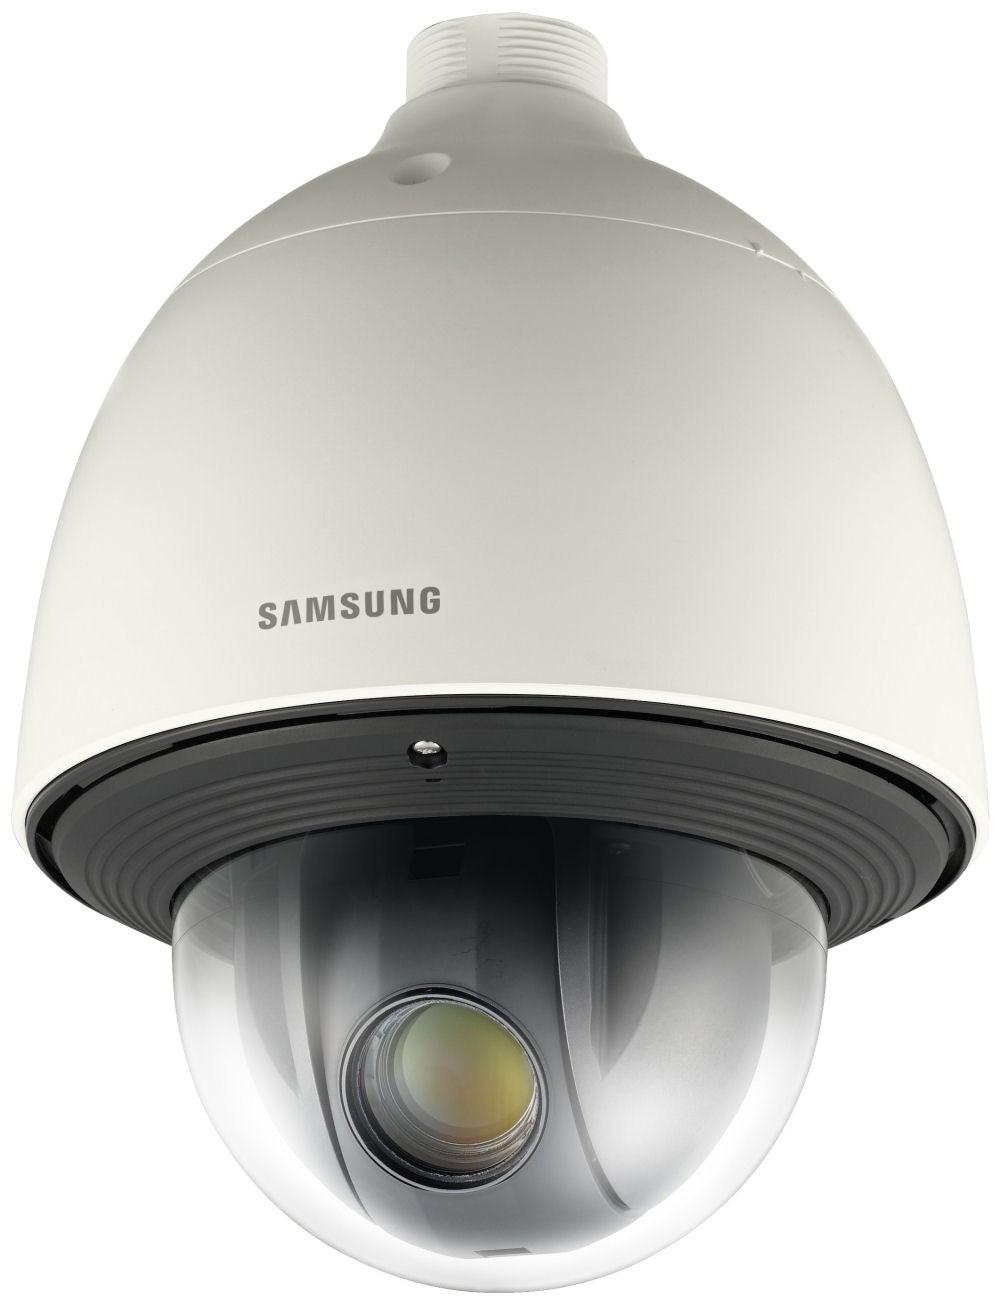 Samsung SNP6201HP 2MP Full HD 20x Compact Network PTZ Camera